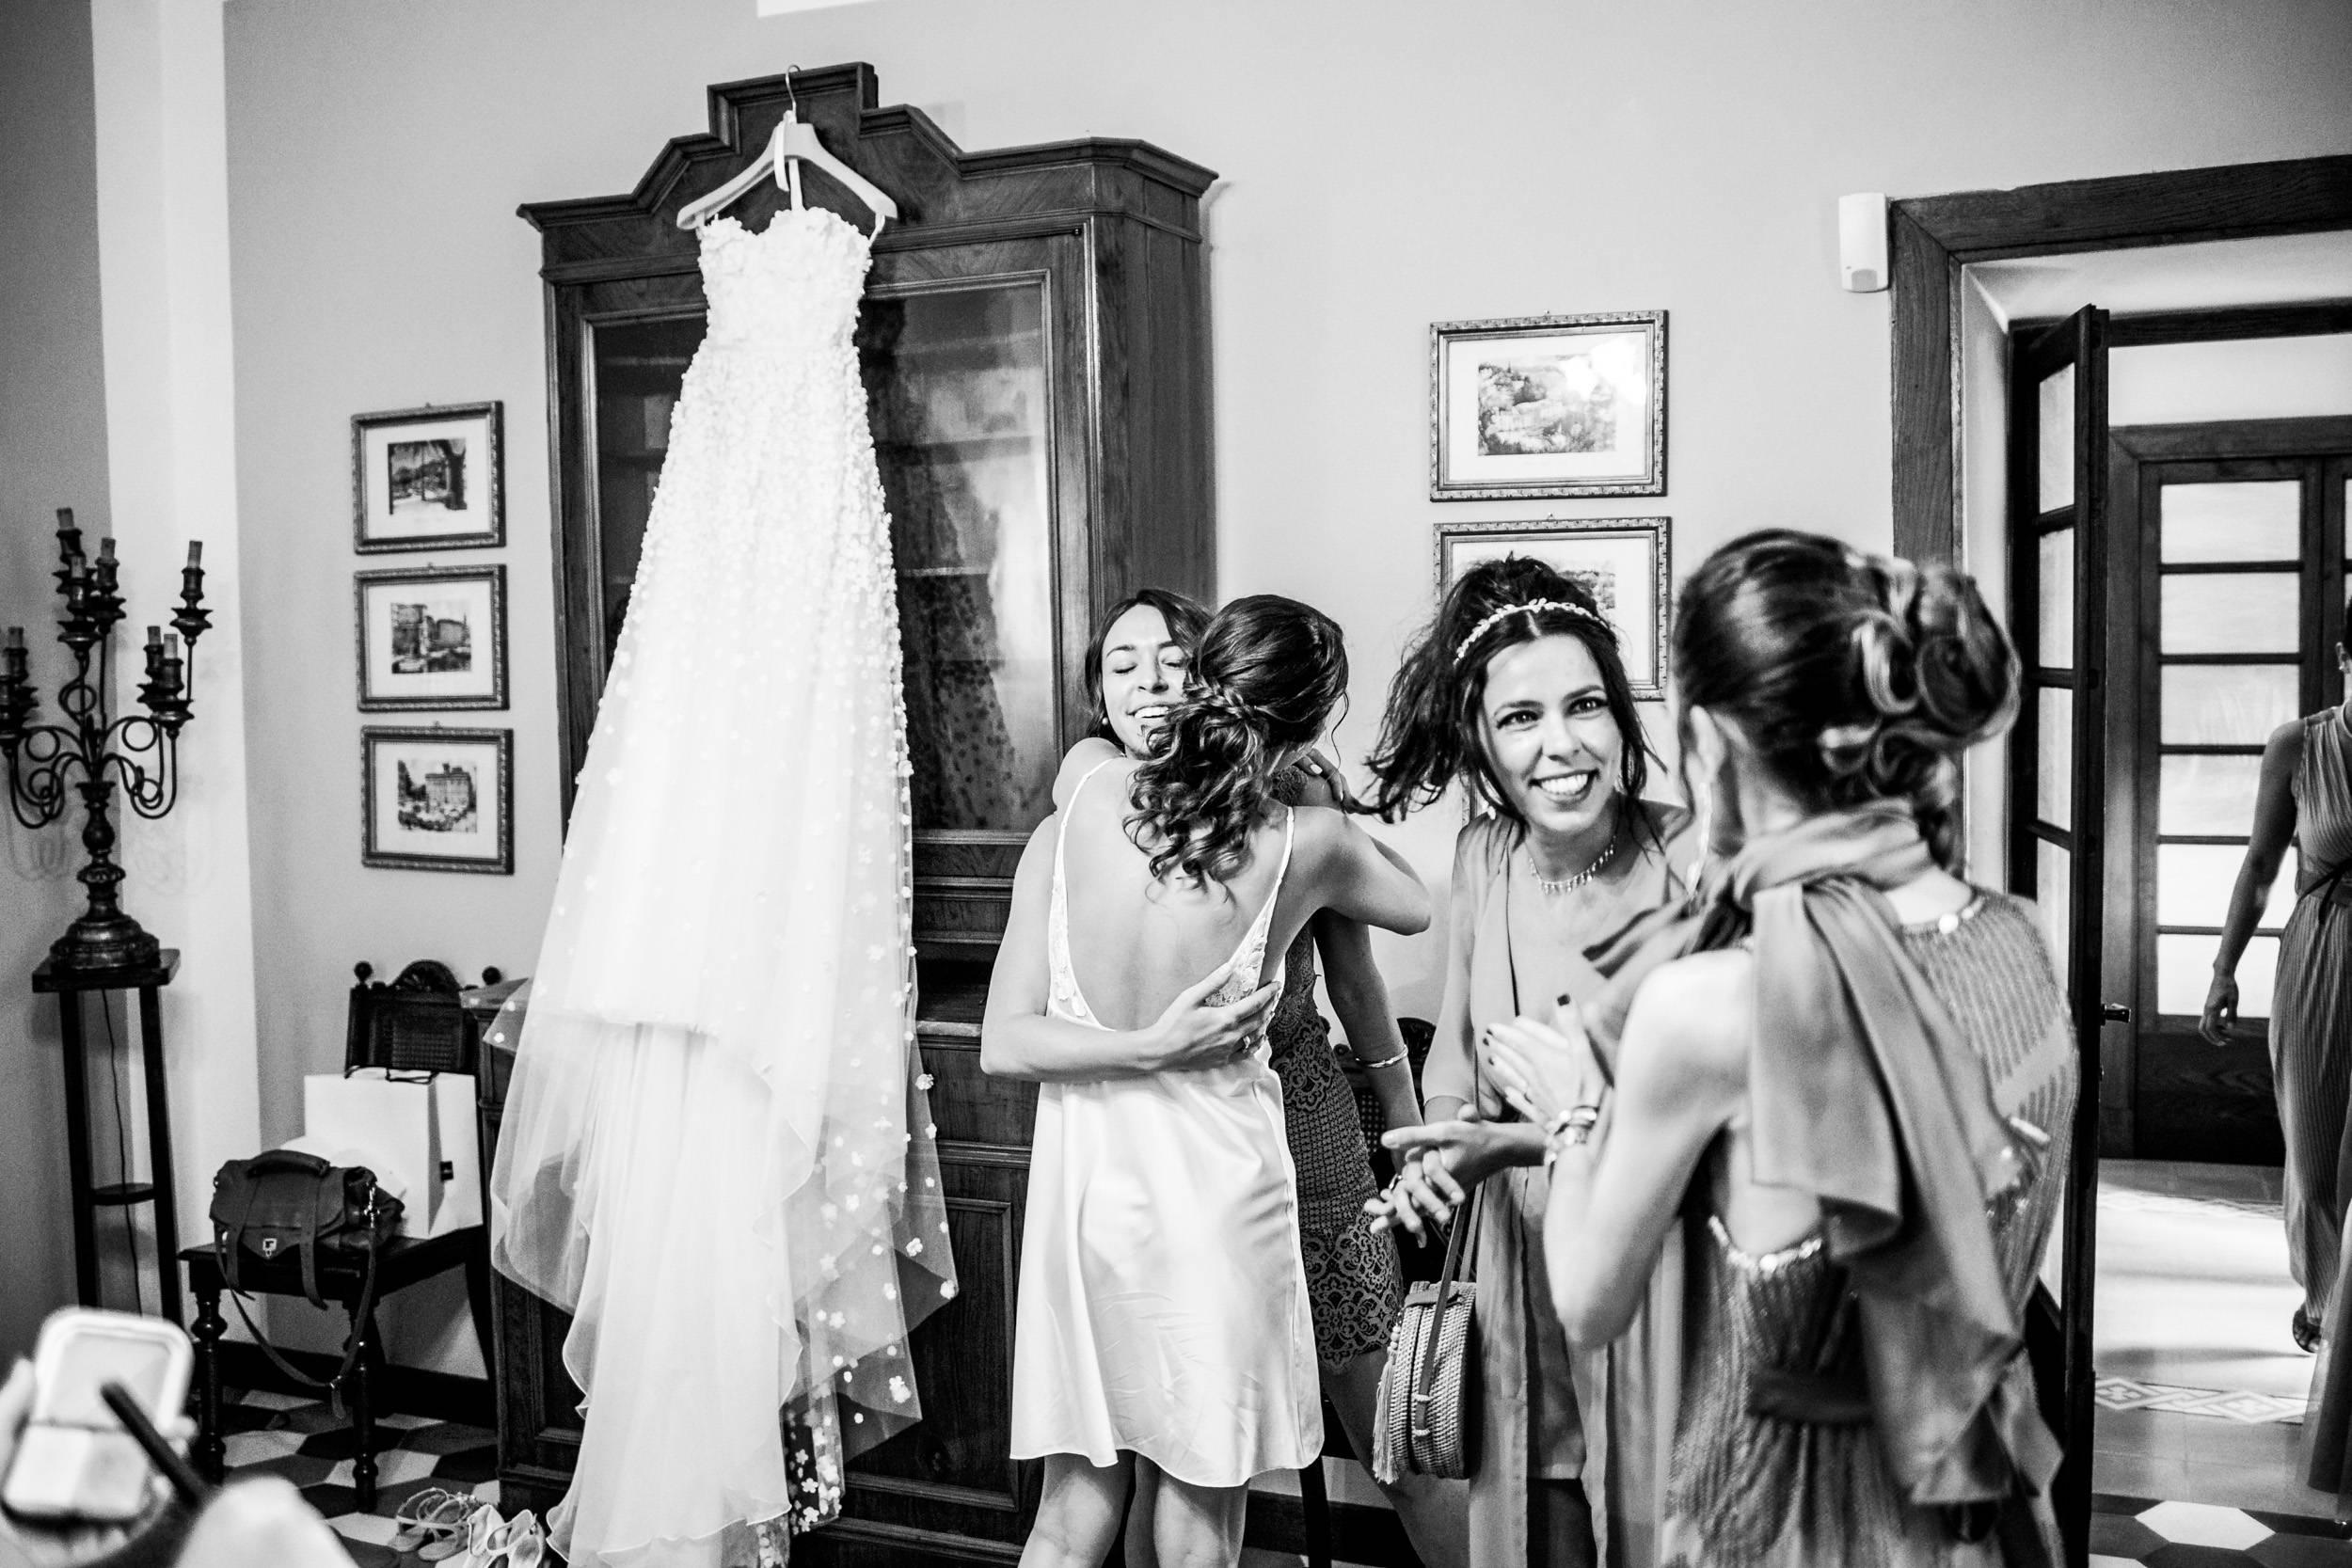 matrimonio_villa-ferrari-gussola_MI-009